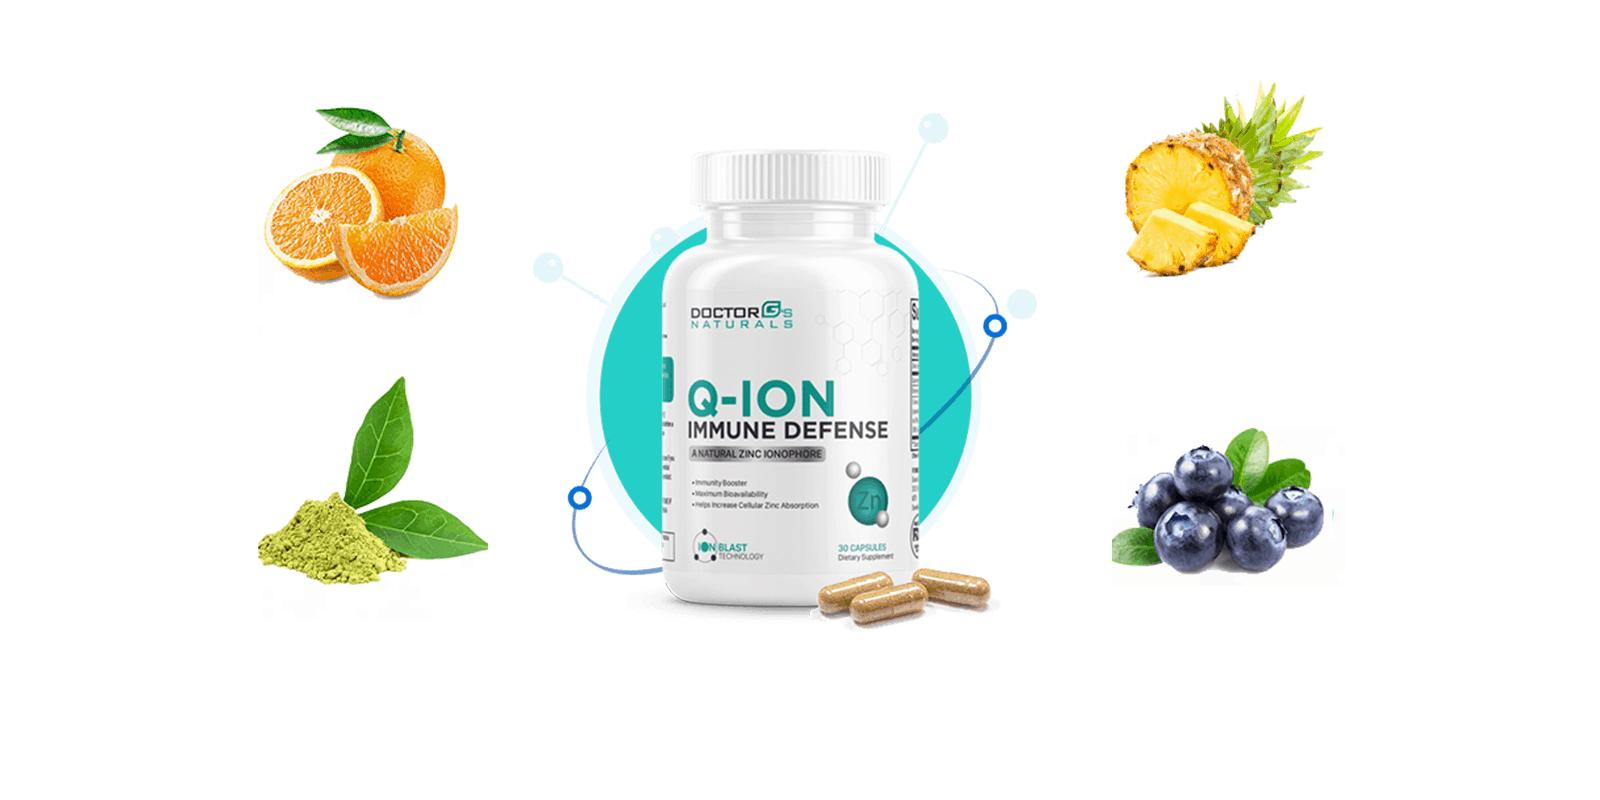 Q-ION Immune Defence ingredients